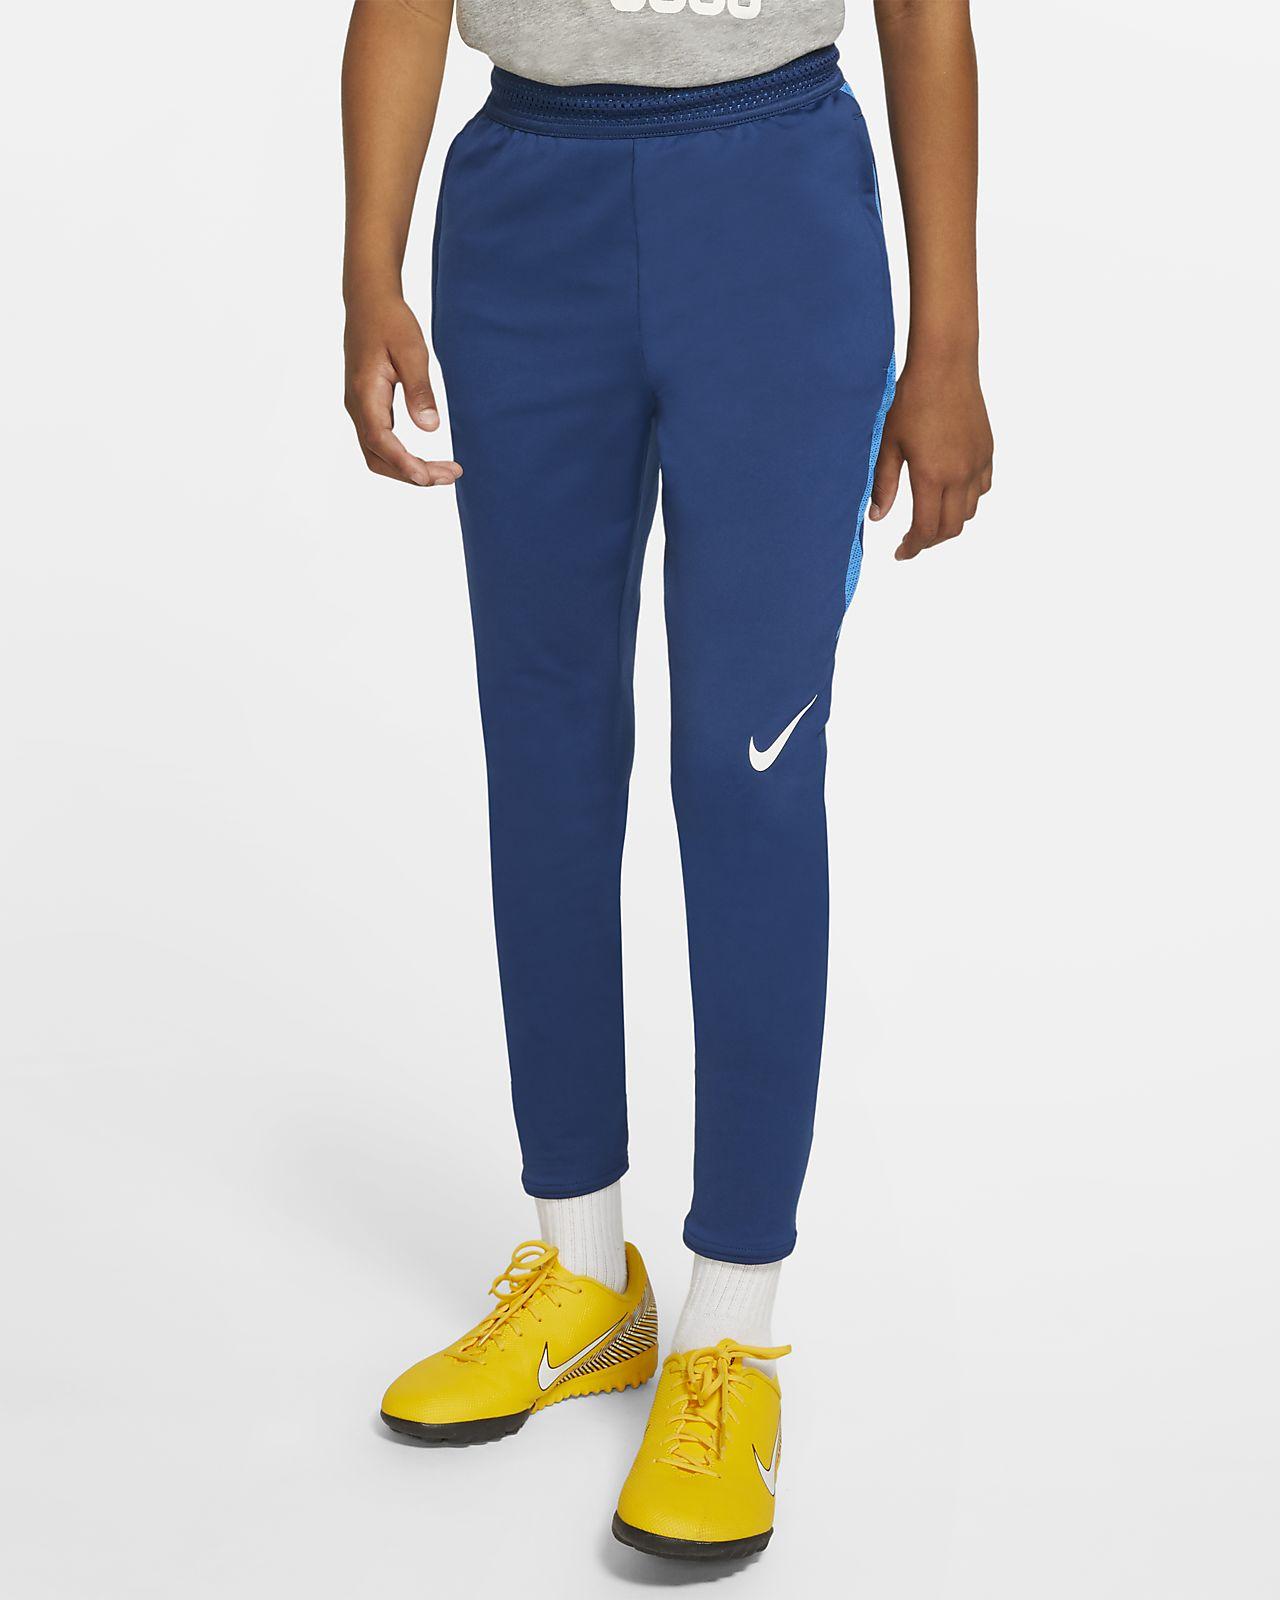 Fotbollsbyxor Nike Dri-FIT Strike för ungdom (killar)